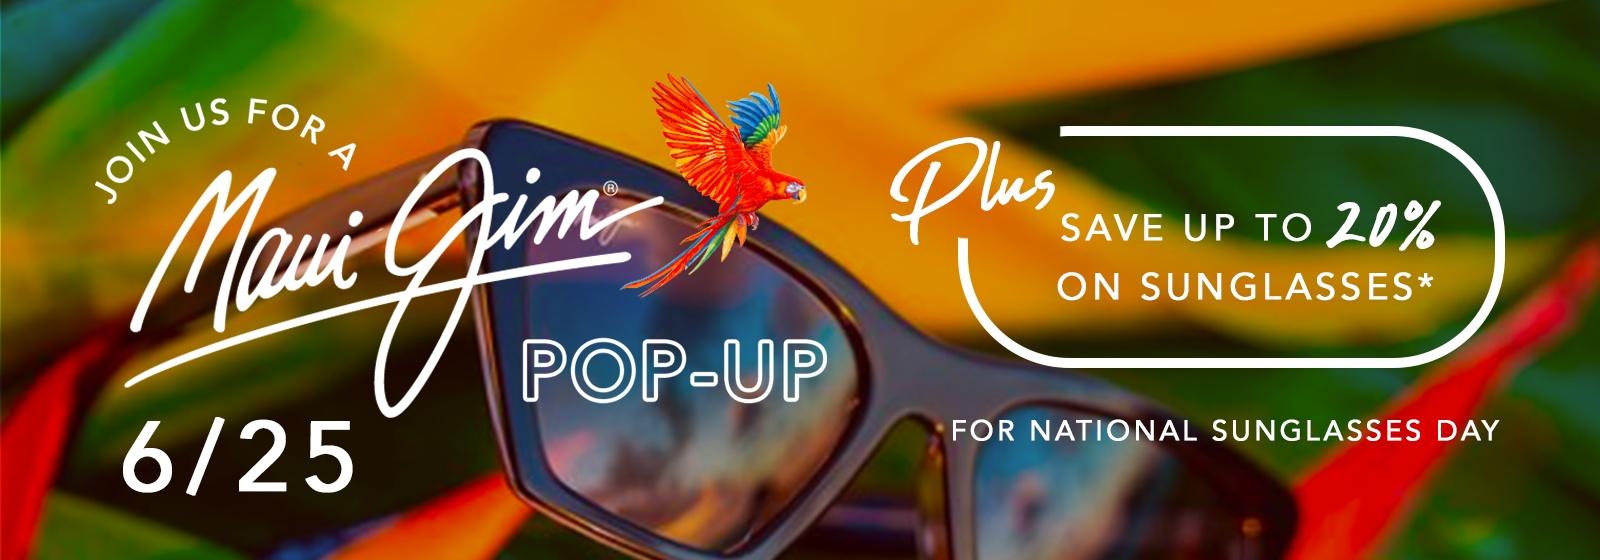 National Sunglasses Day Maui Jim pop-up